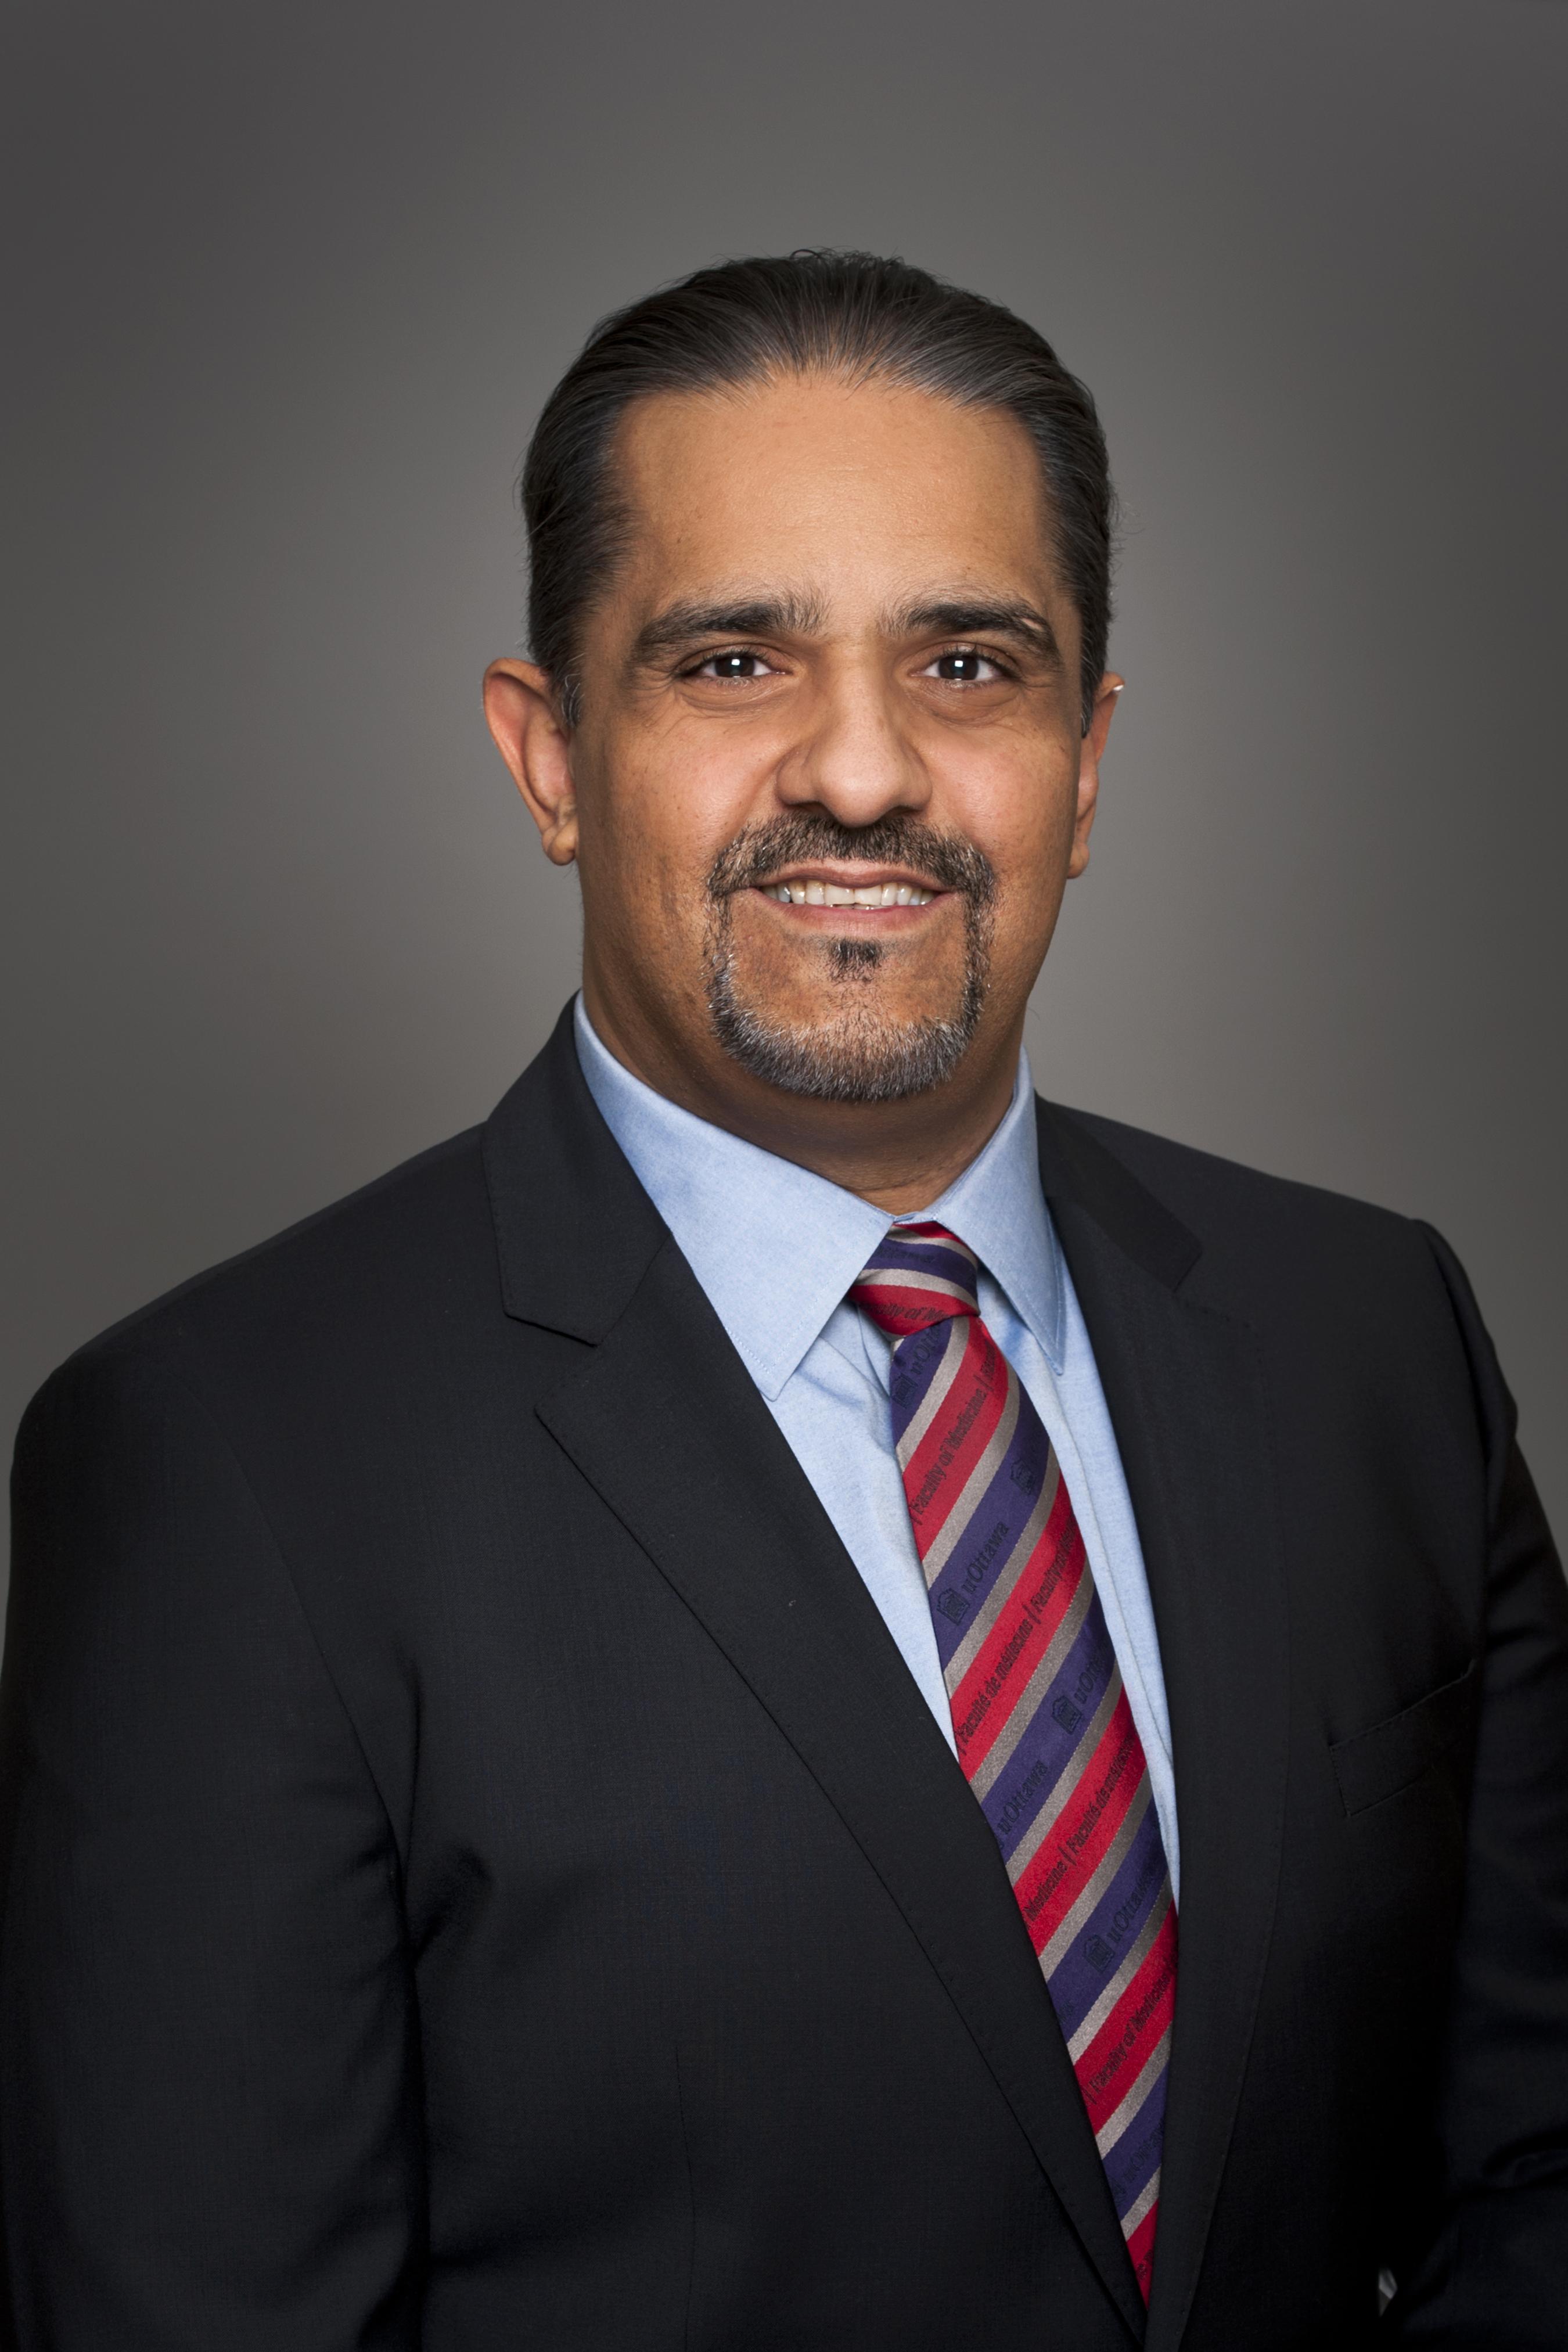 Dr Alireza Jalali